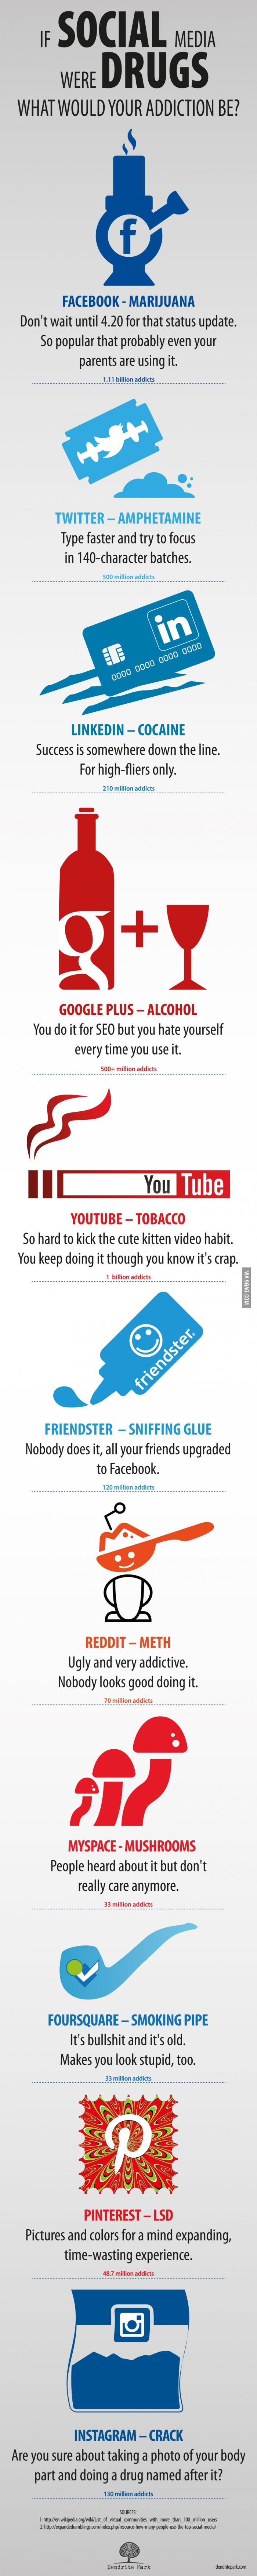 If Social Media Were Drugs #LOL #funny #9gag